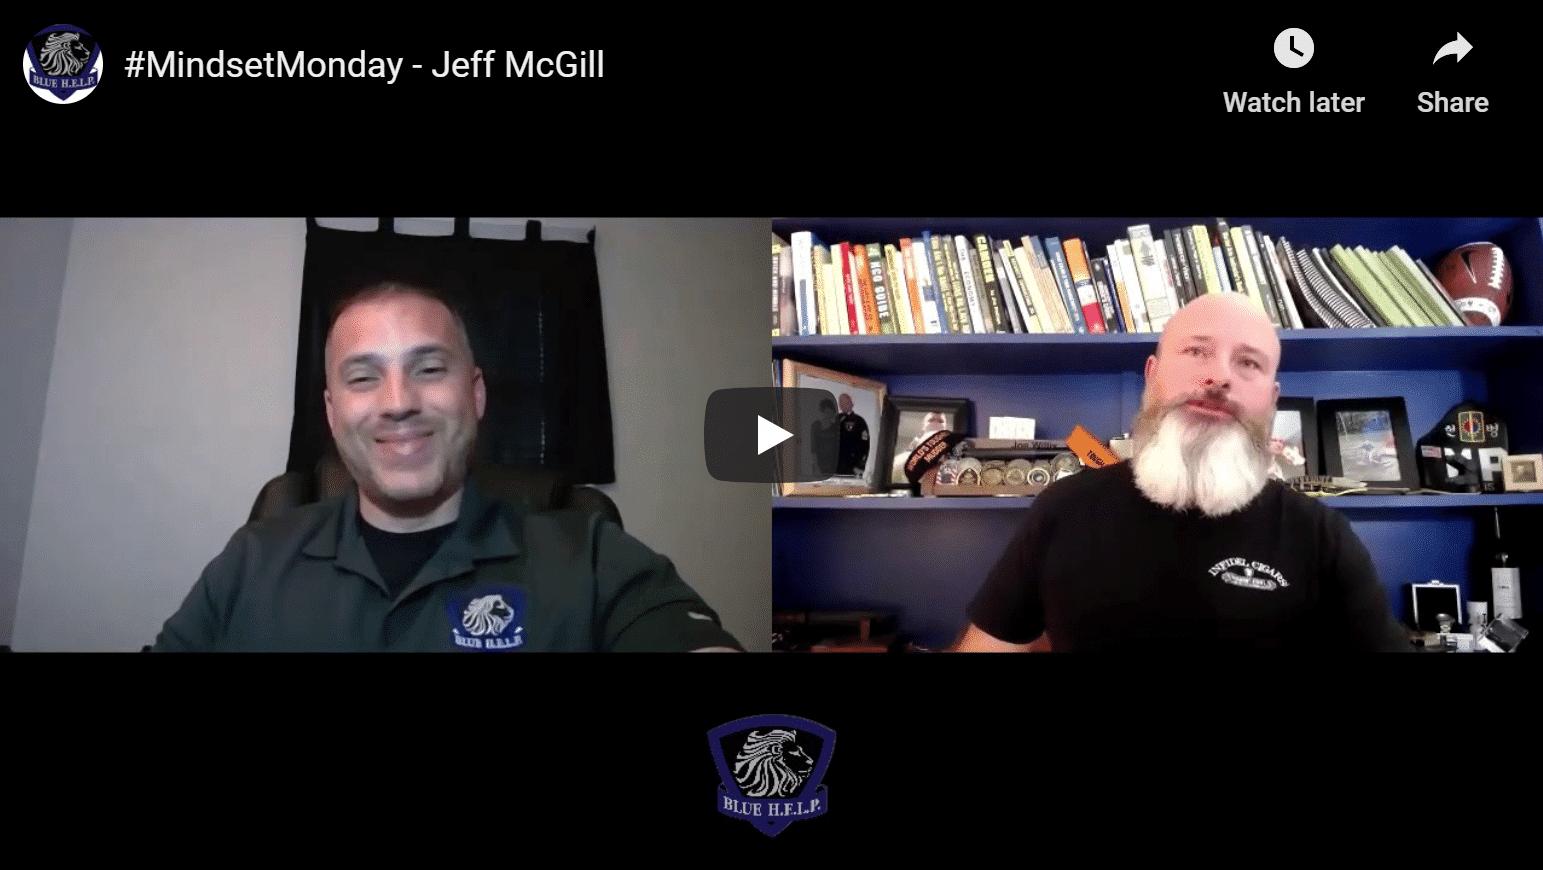 #MindsetMonday – Dr. Jeff McGill